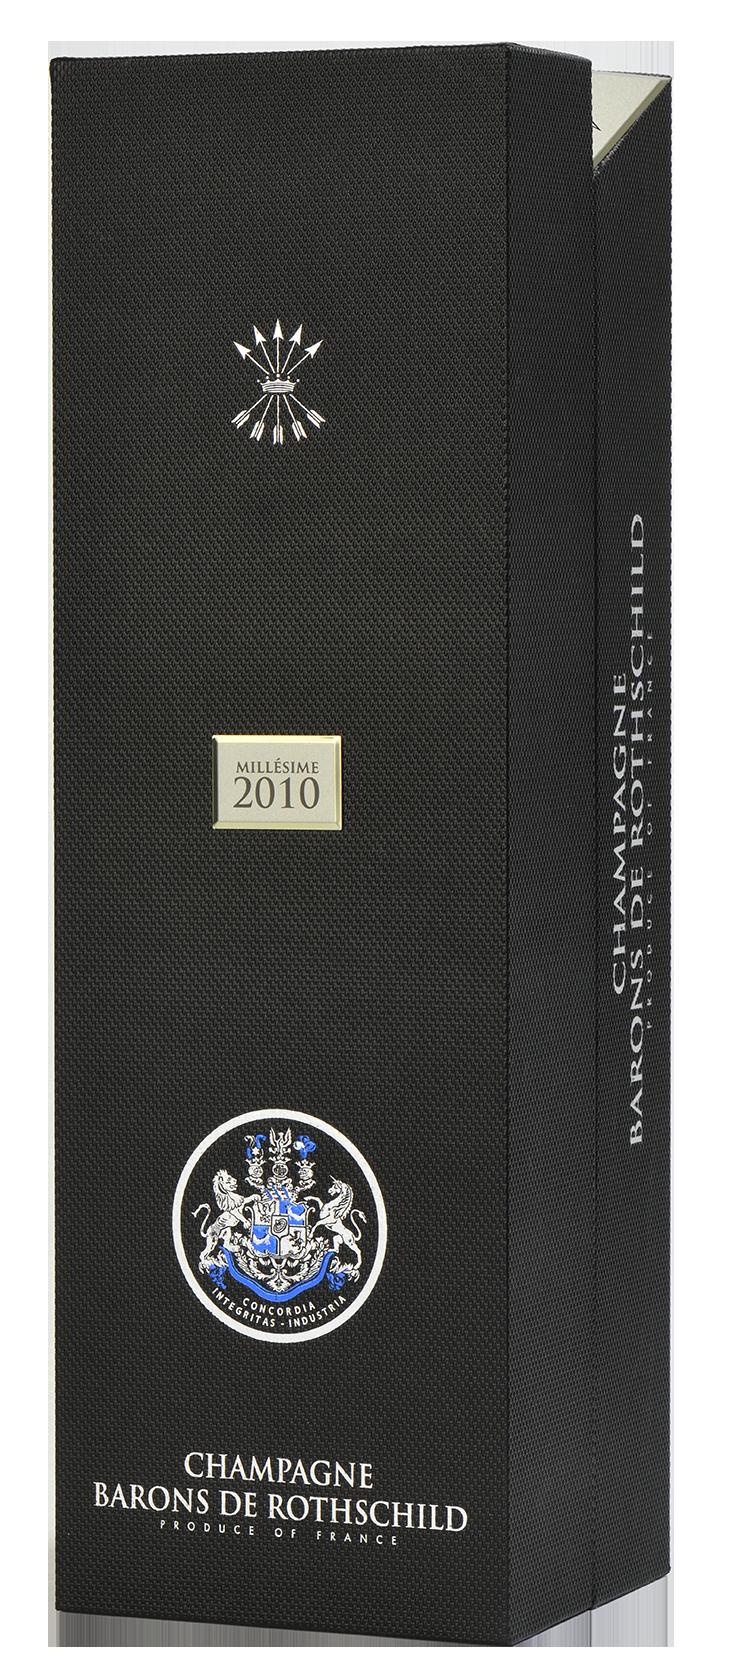 Millesime 2010 - 2 1